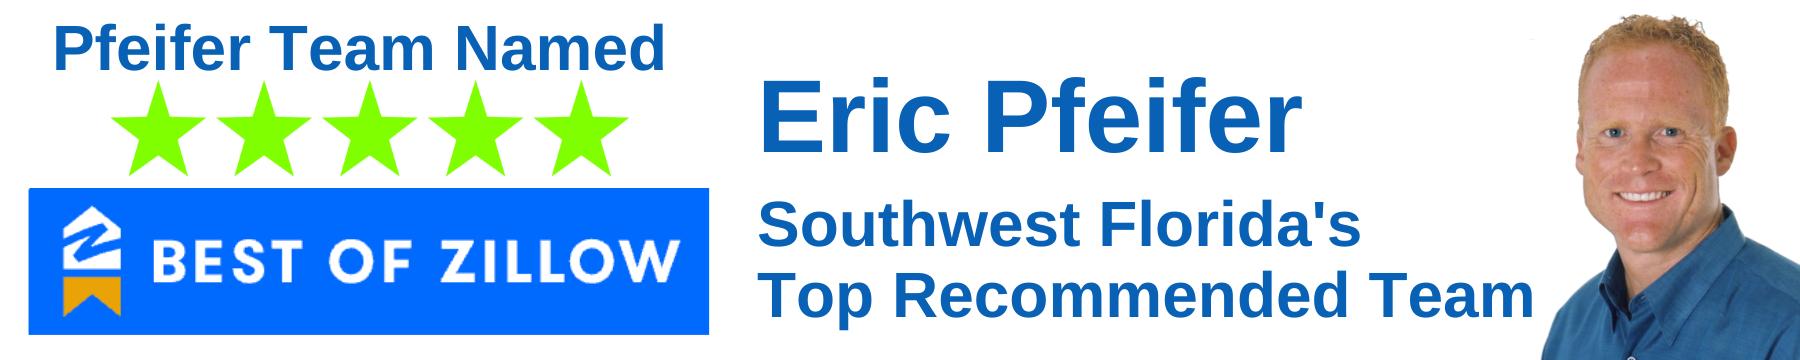 Eric Pfeifer Team Named BEST OF ZILLOW